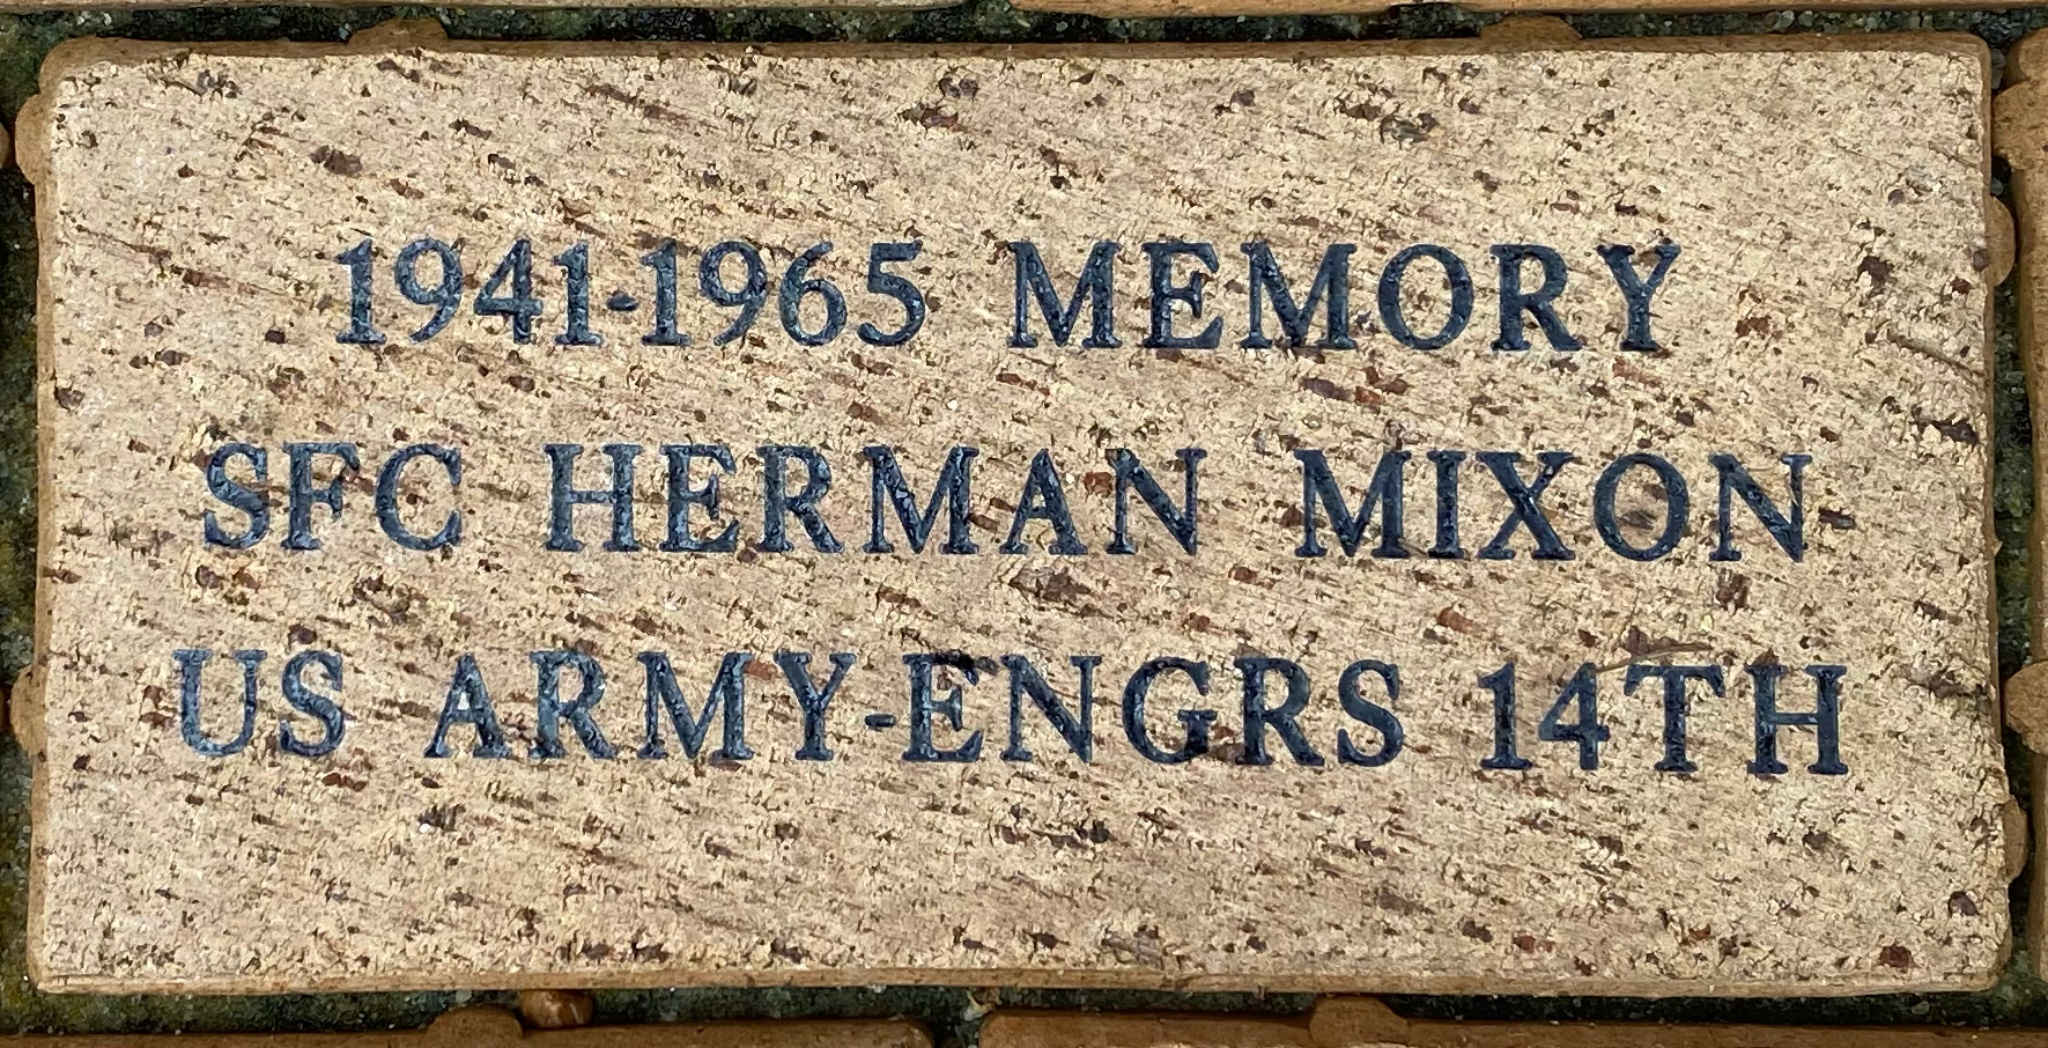 1941-1965 MEMORY SFC HERMAN MIXON US ARMY-ENGRS 14TH